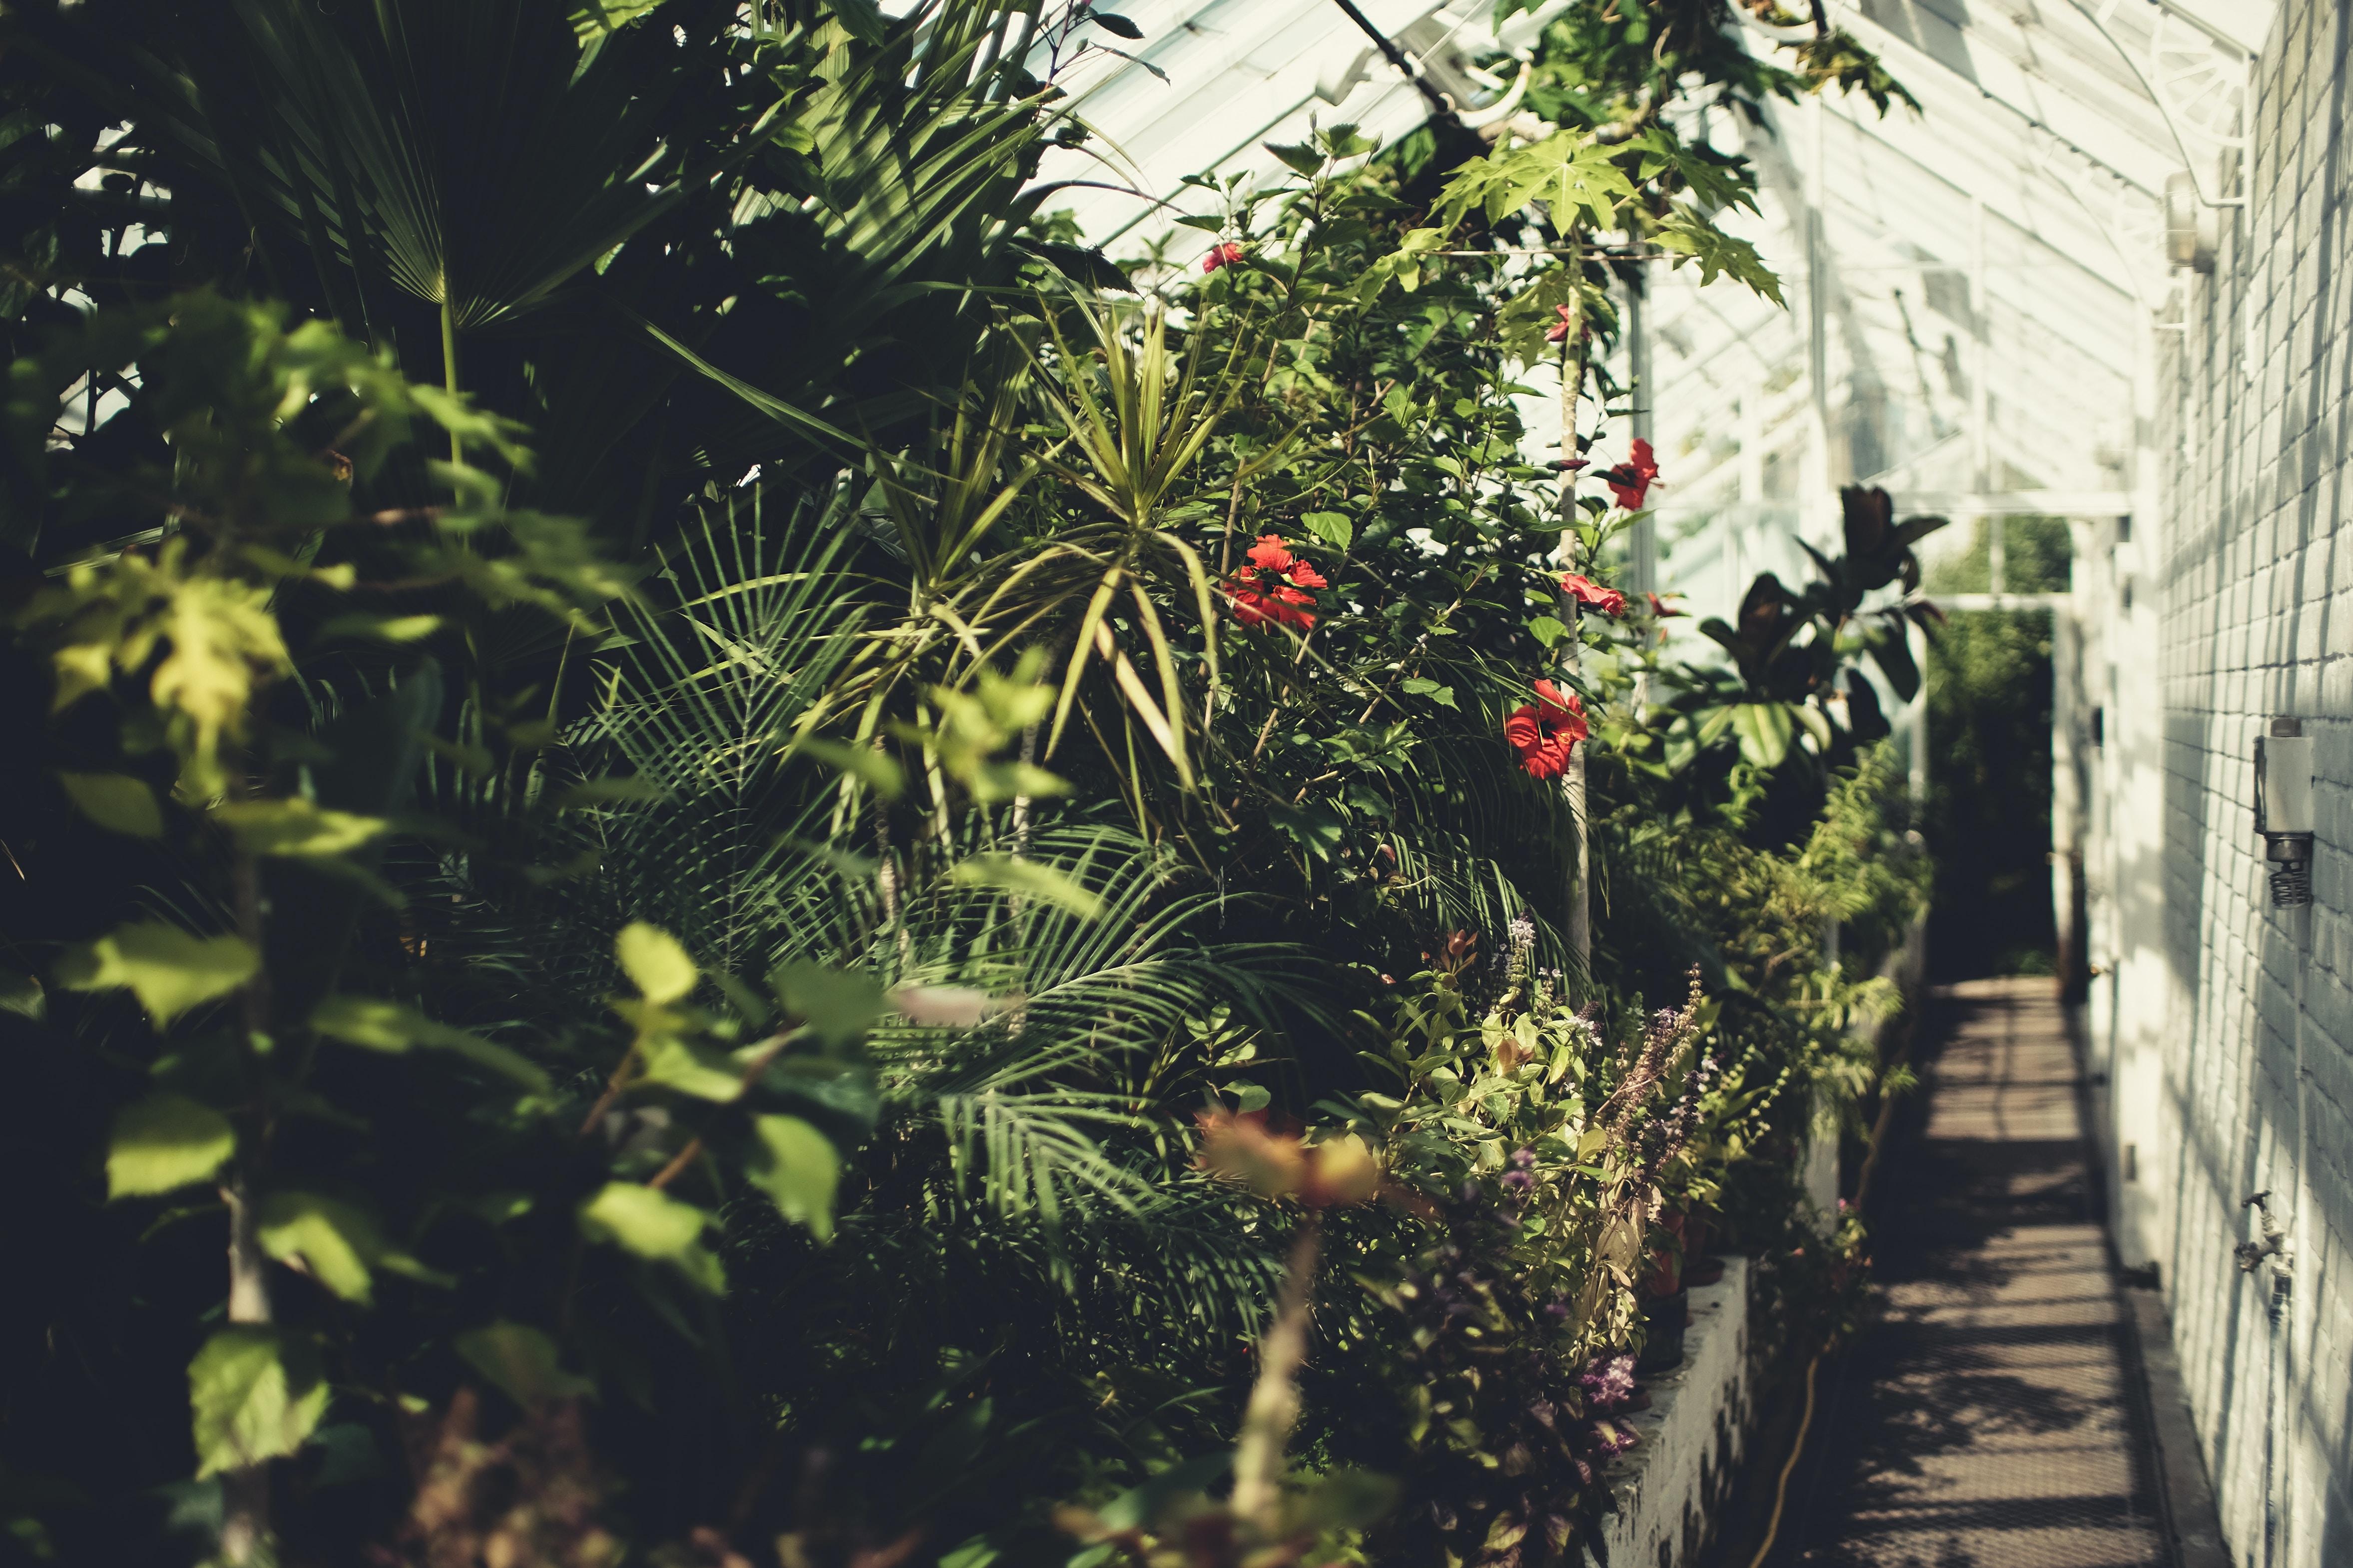 plants inside greenhouse